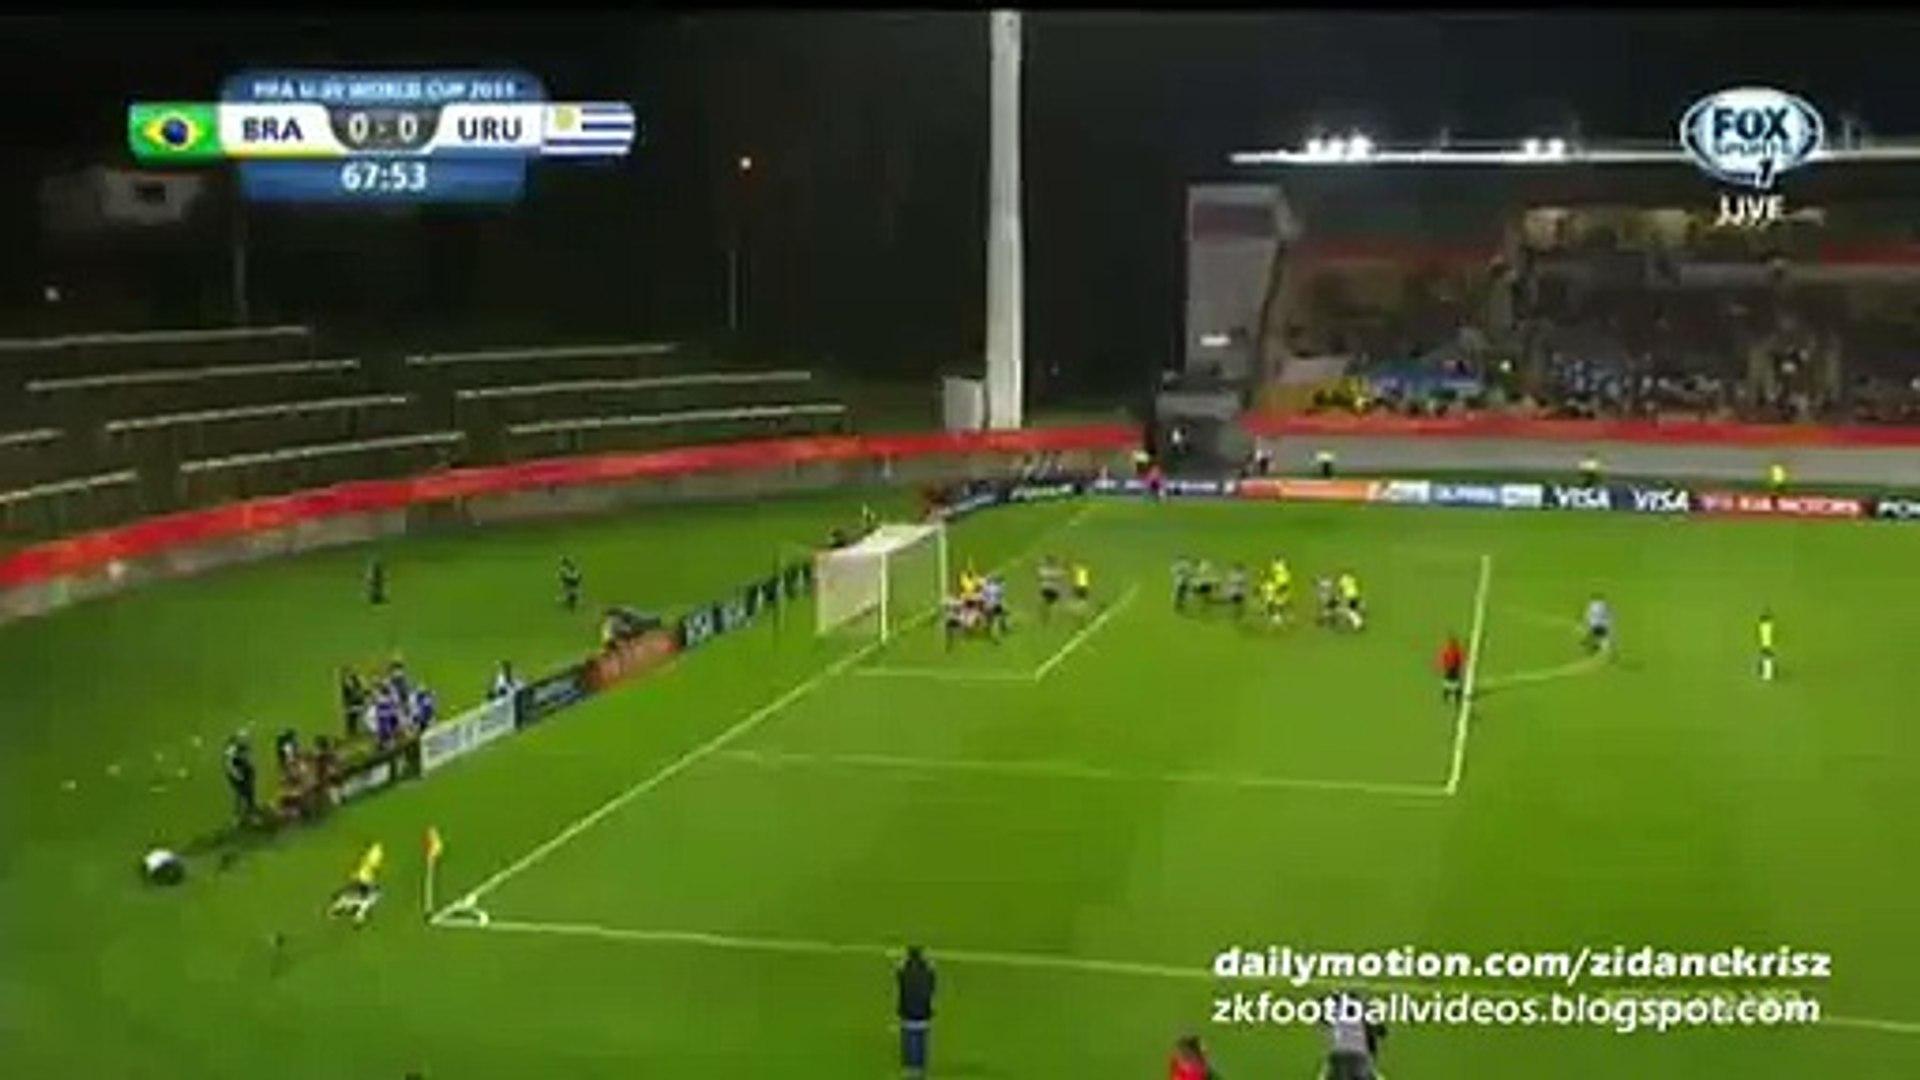 Danilo Incredible Miss From 2 meter - Brazil v. Uruguay - FIFA U20 World Cup 11.06.2015